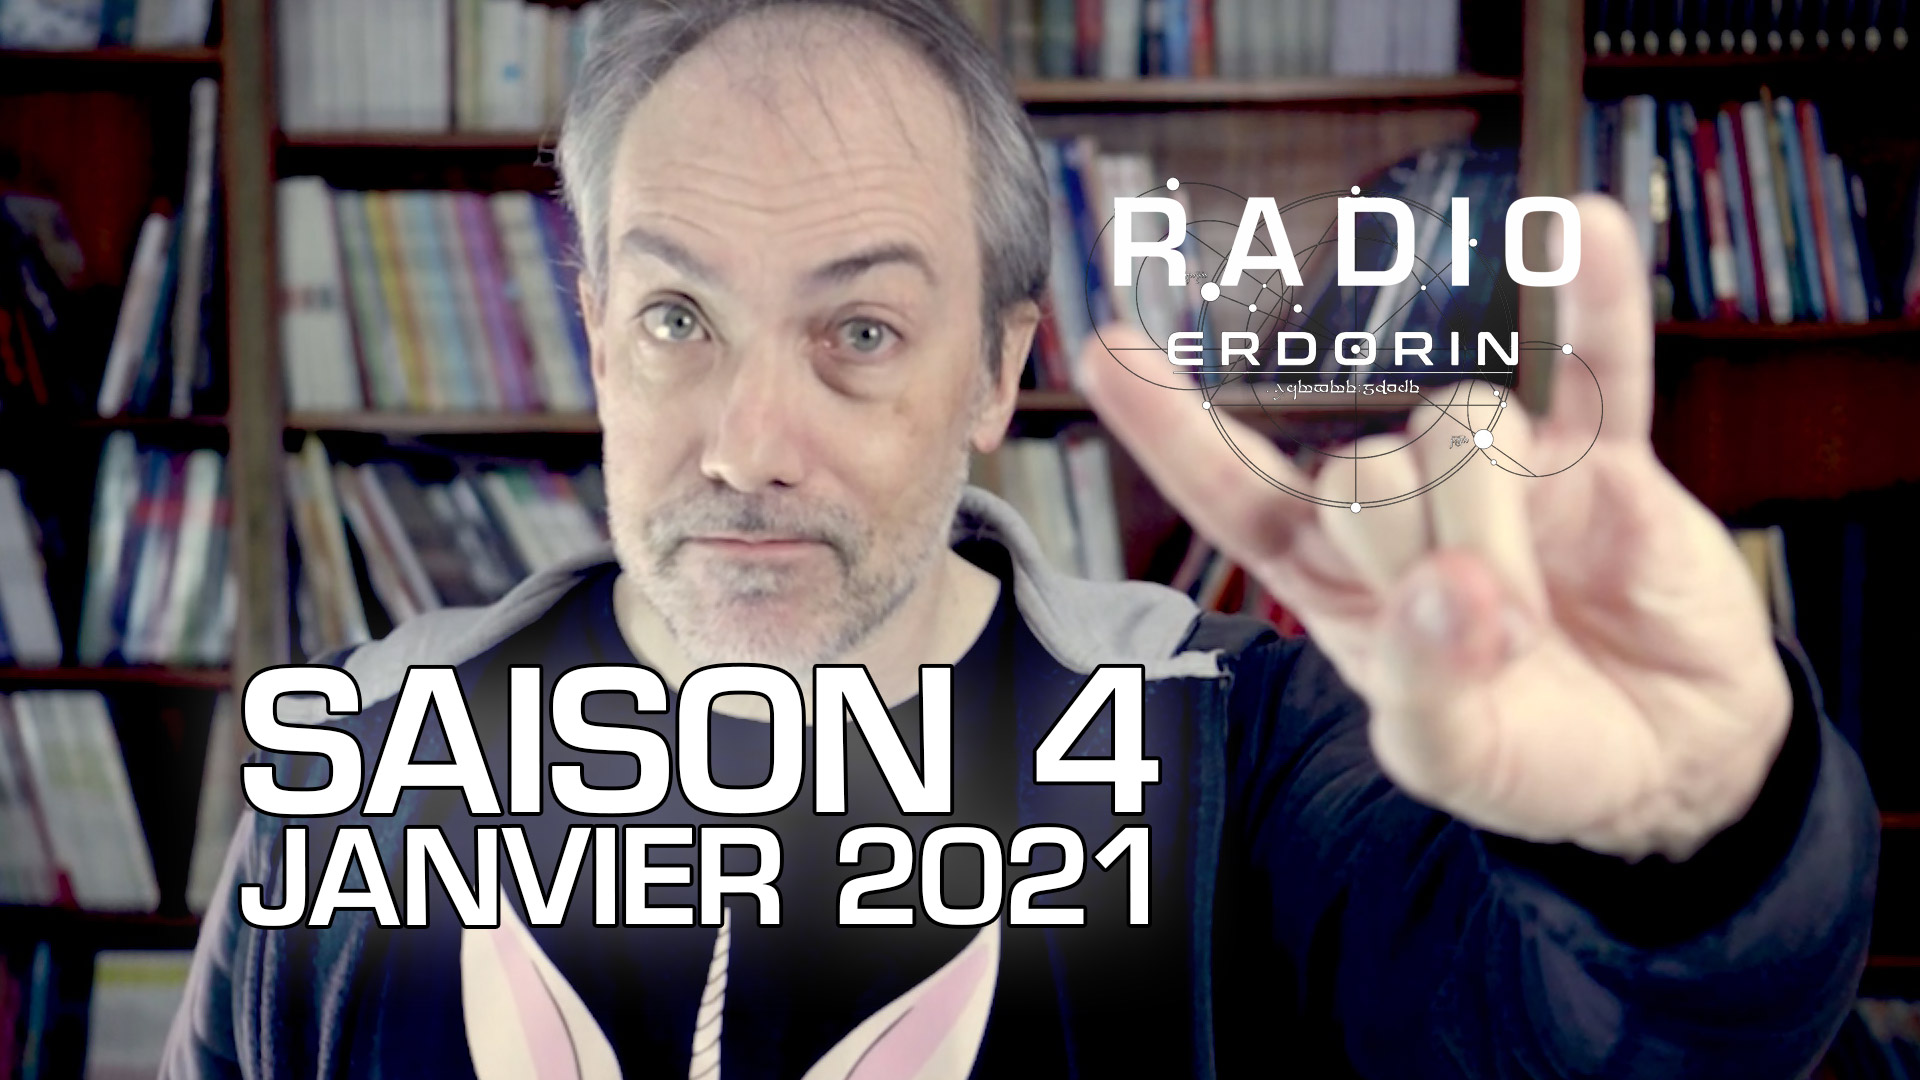 Radio-Erdorin S4E01 – Janvier 2021